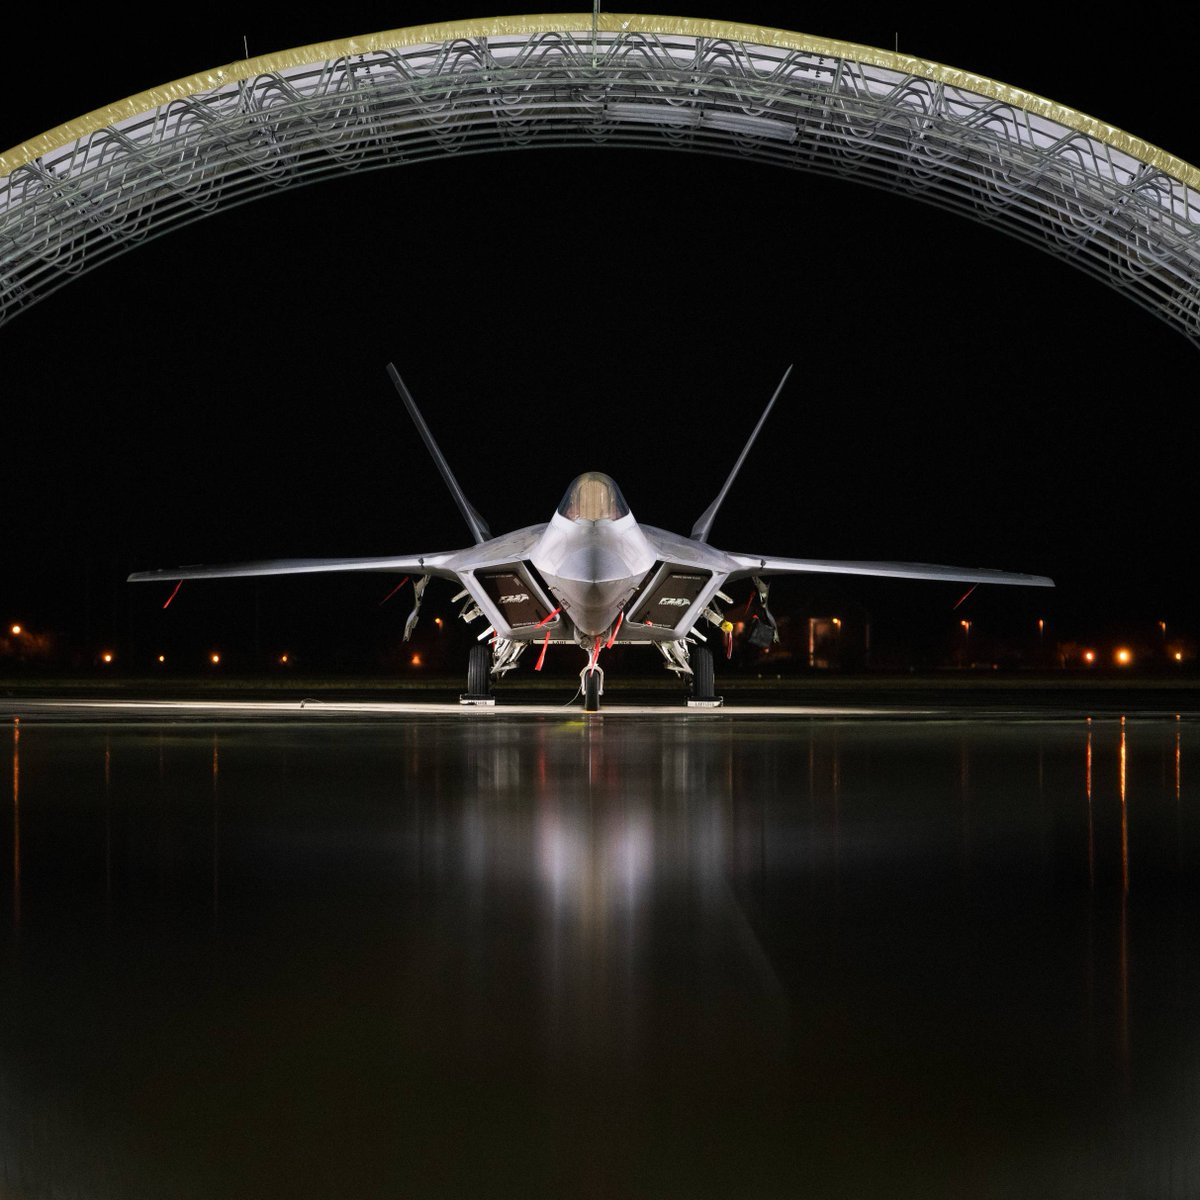 F-22 Raptor at JB Langley-Eustis, Virginia.  . . . #F22 #Raptor #F22Raptor #FighterJet #Fighter #USA #Aircraft #Aviation #USAF #AirForce #AirForceVeterans #Veterans #AviationLife #Pilot #PilotLife #MilitaryPhotography #Military #Stealth #FifthGeneration #MilitaryMachine